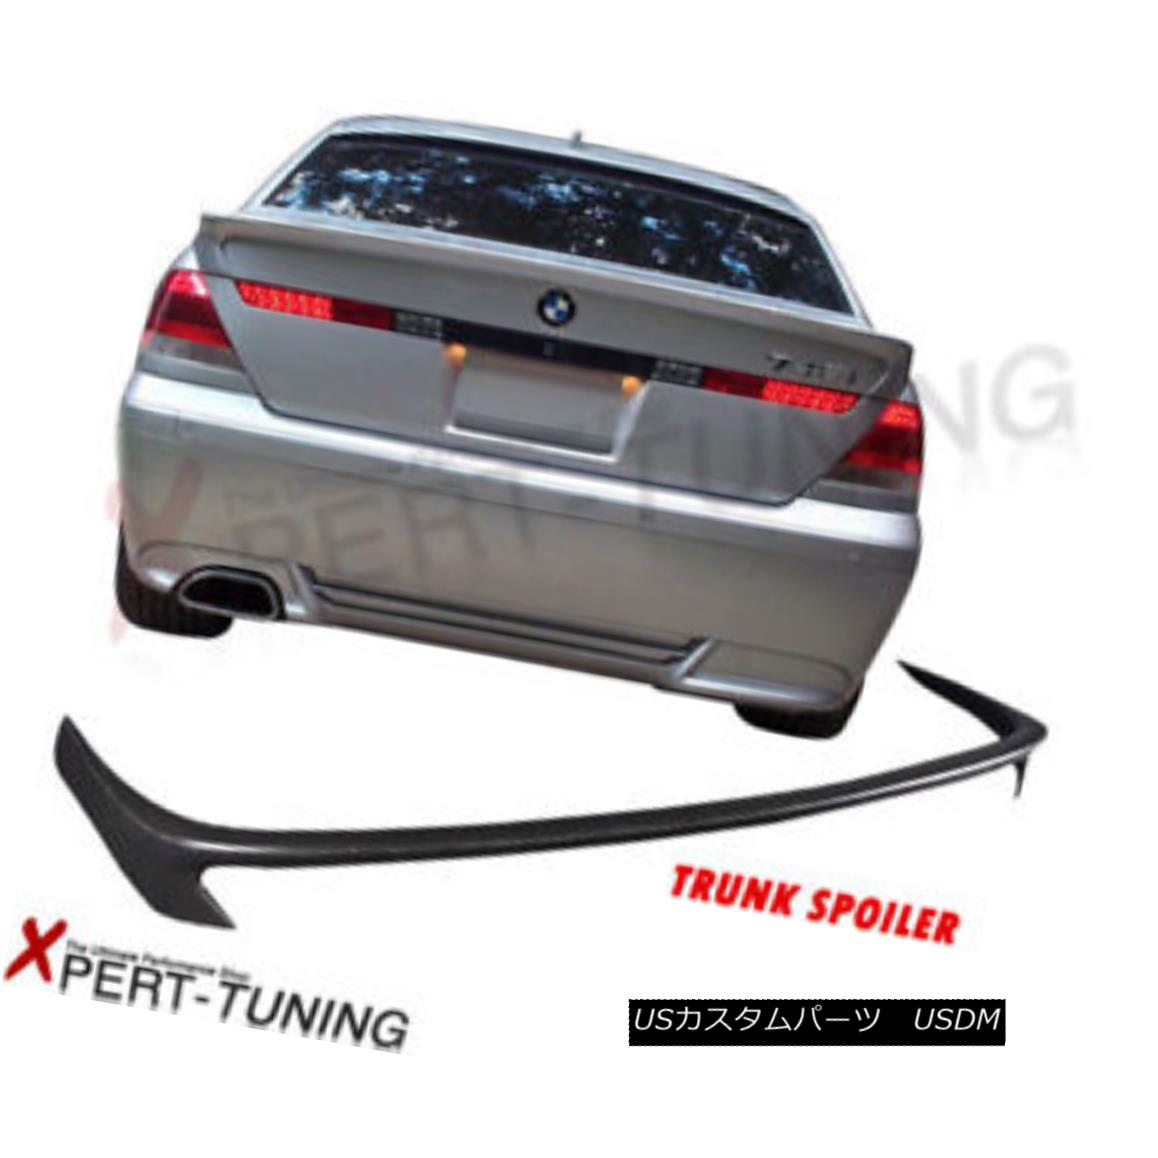 <title>車用品 バイク用品 >> パーツ 外装 エアロパーツ リアスポイラー 02-05 BMW E65 7-Series 745i 760i AC-S PU Rear Trunk Lid 価格 交渉 送料無料 Spoiler Bodykit 7シリーズ745i PUリアトランクリッドスポイラーボディキット</title>